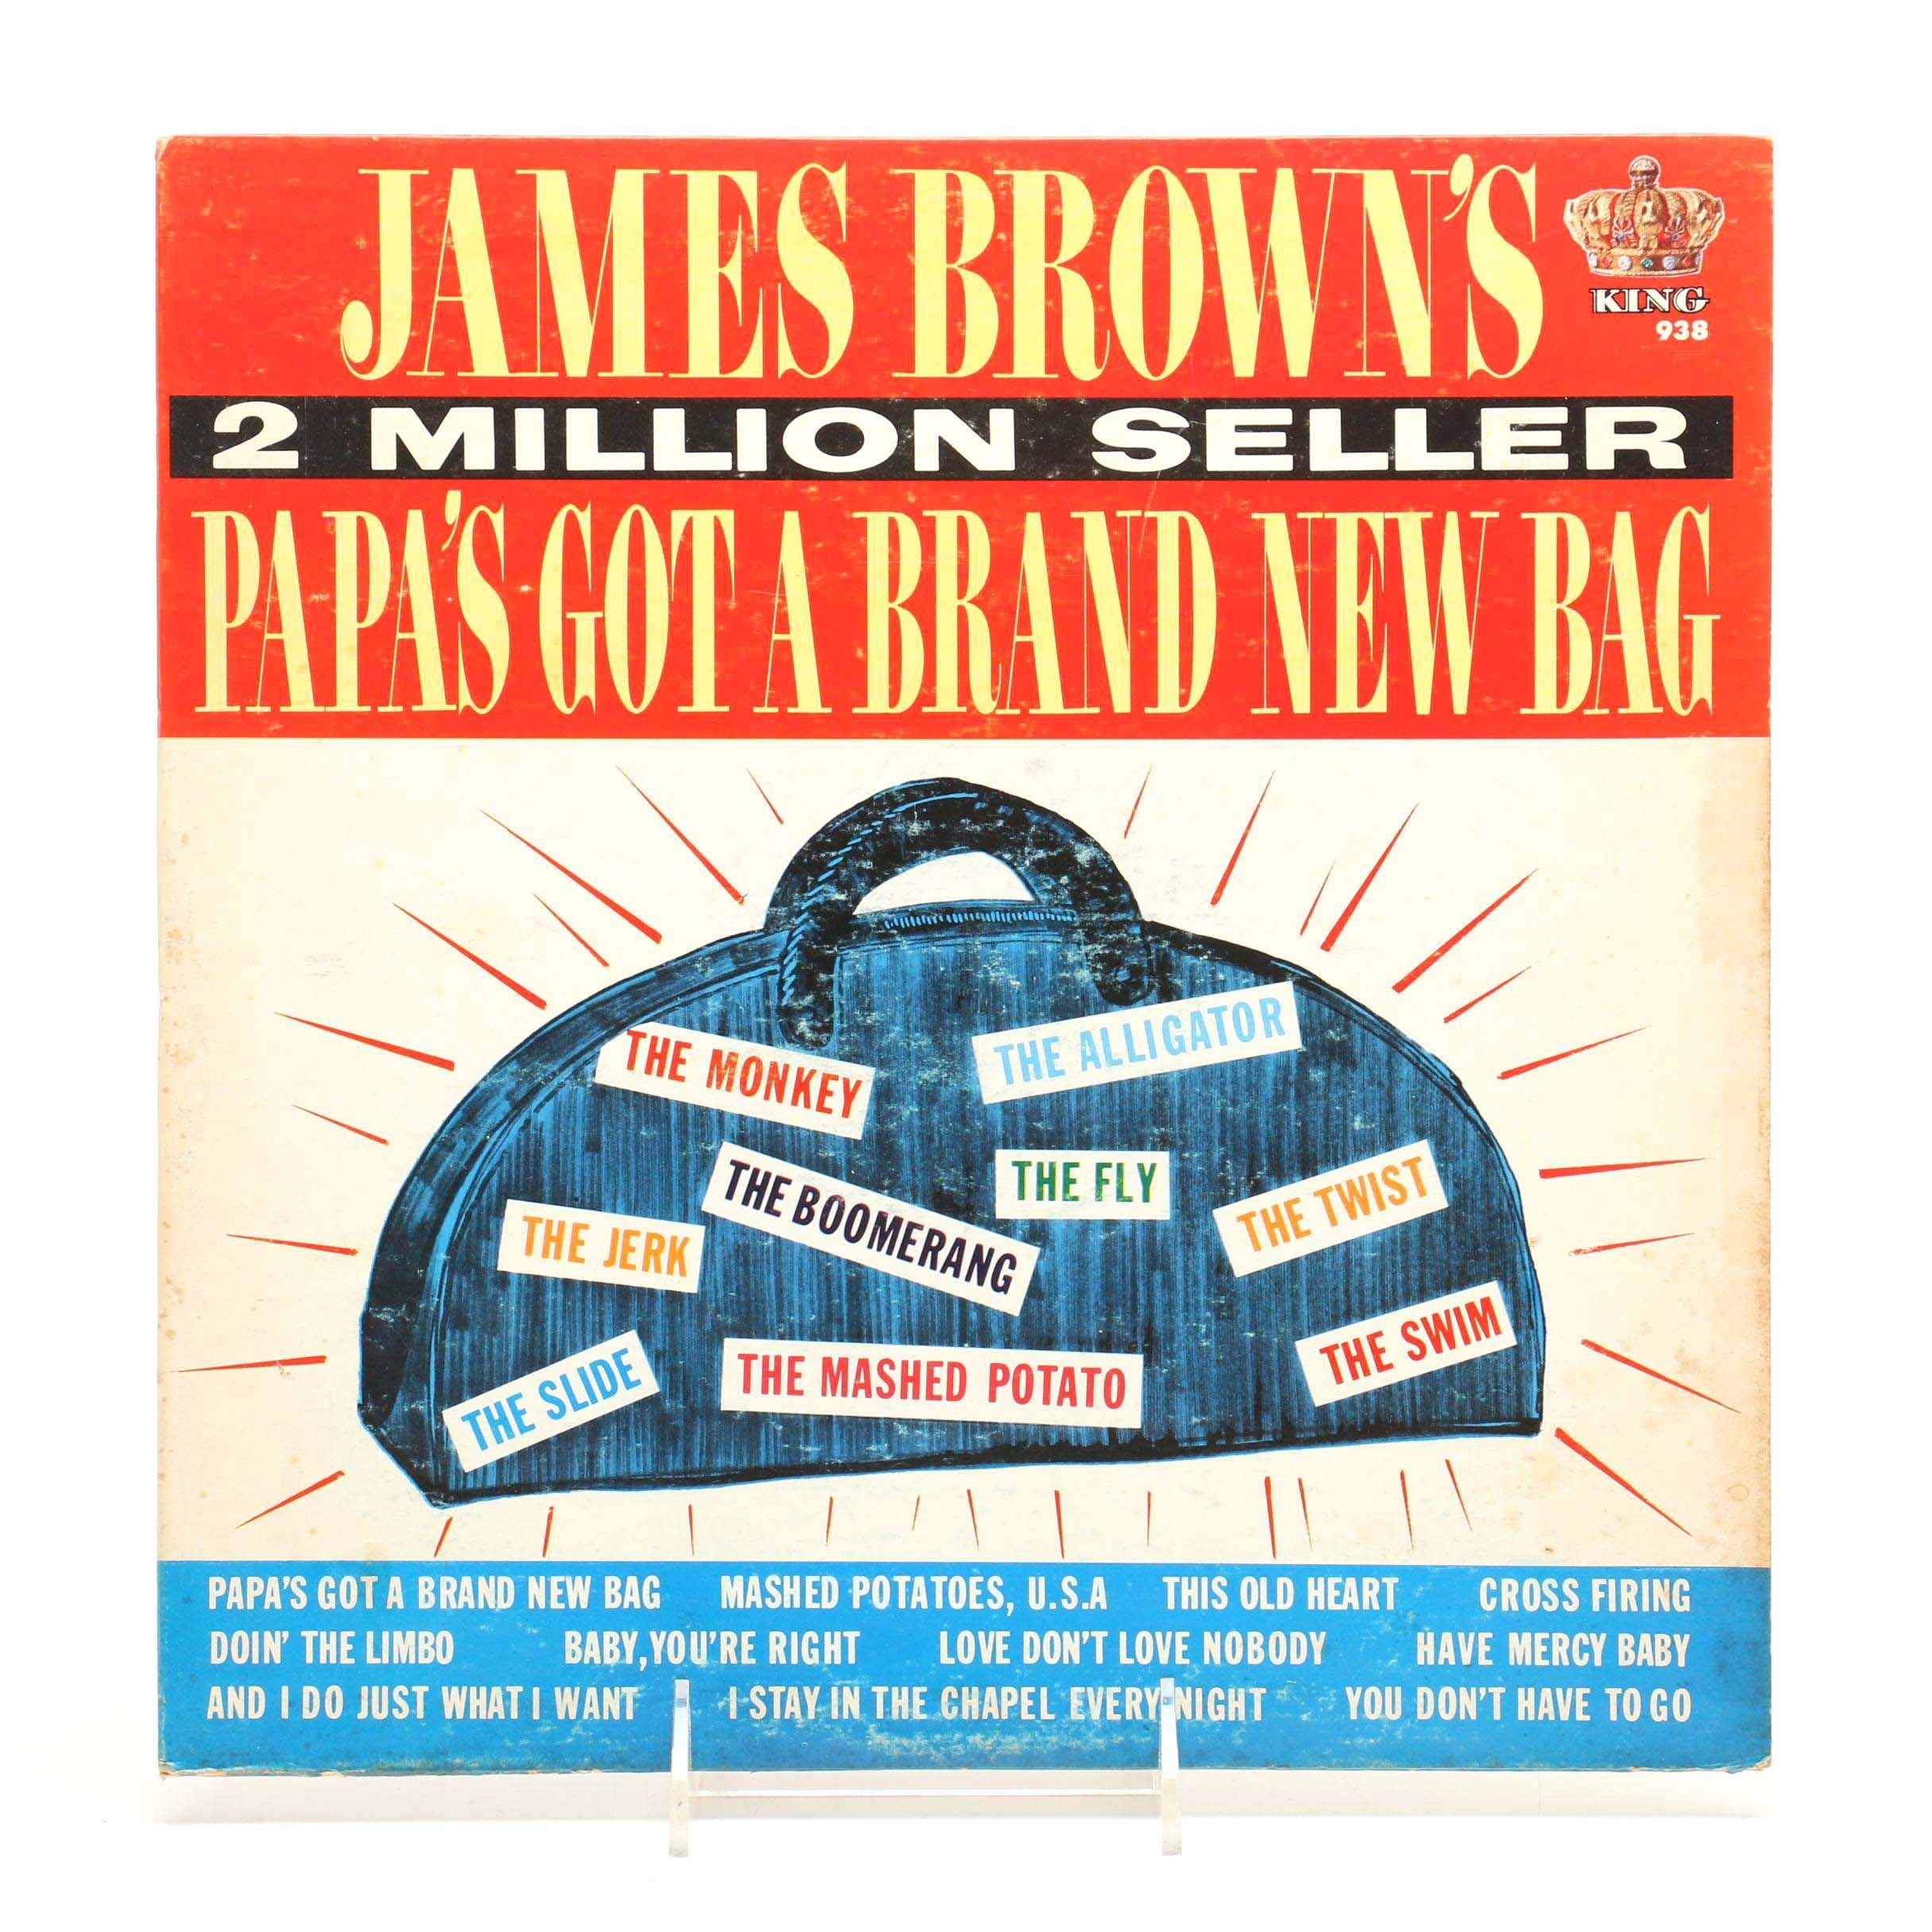 "James Brown ""Papa's Got a Brand New Bag"" King Records LP"